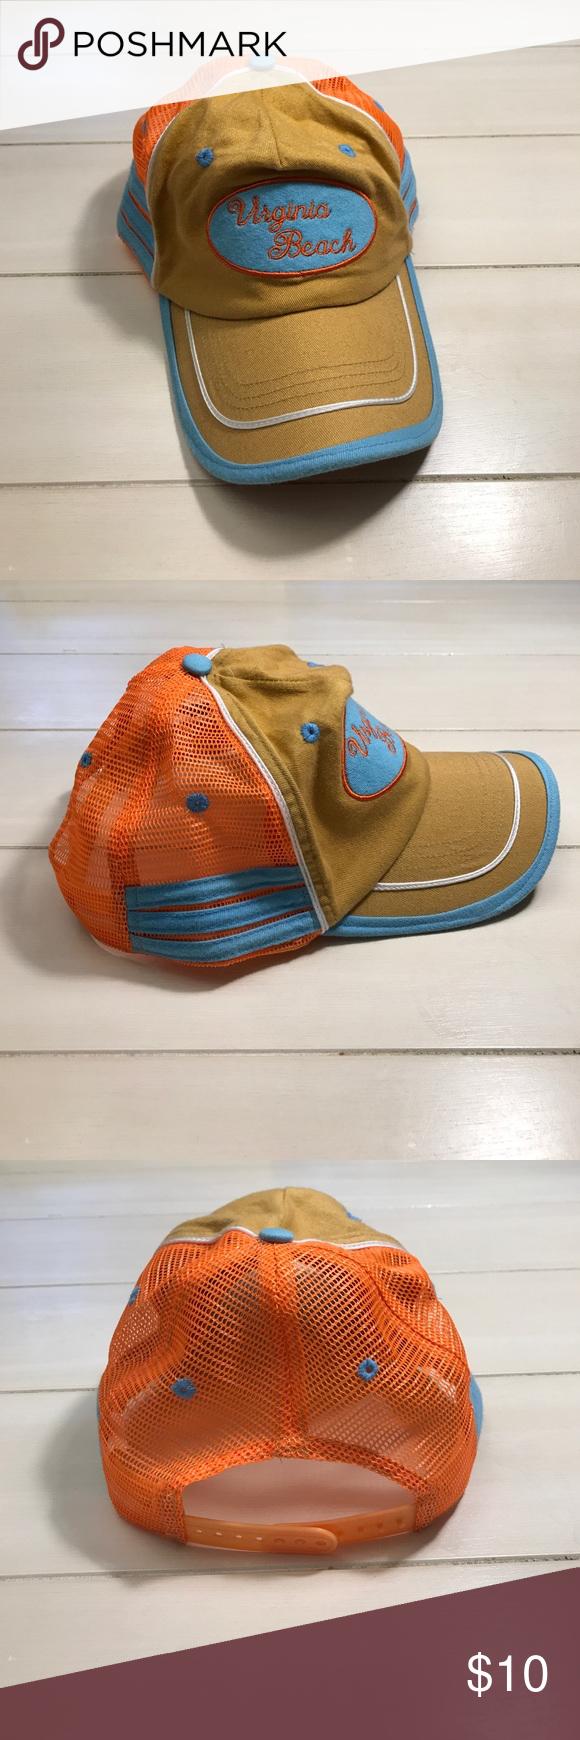 Virginia Beach Hat Summer Time Adorable Women S Va In Great Colors Accessories Hats